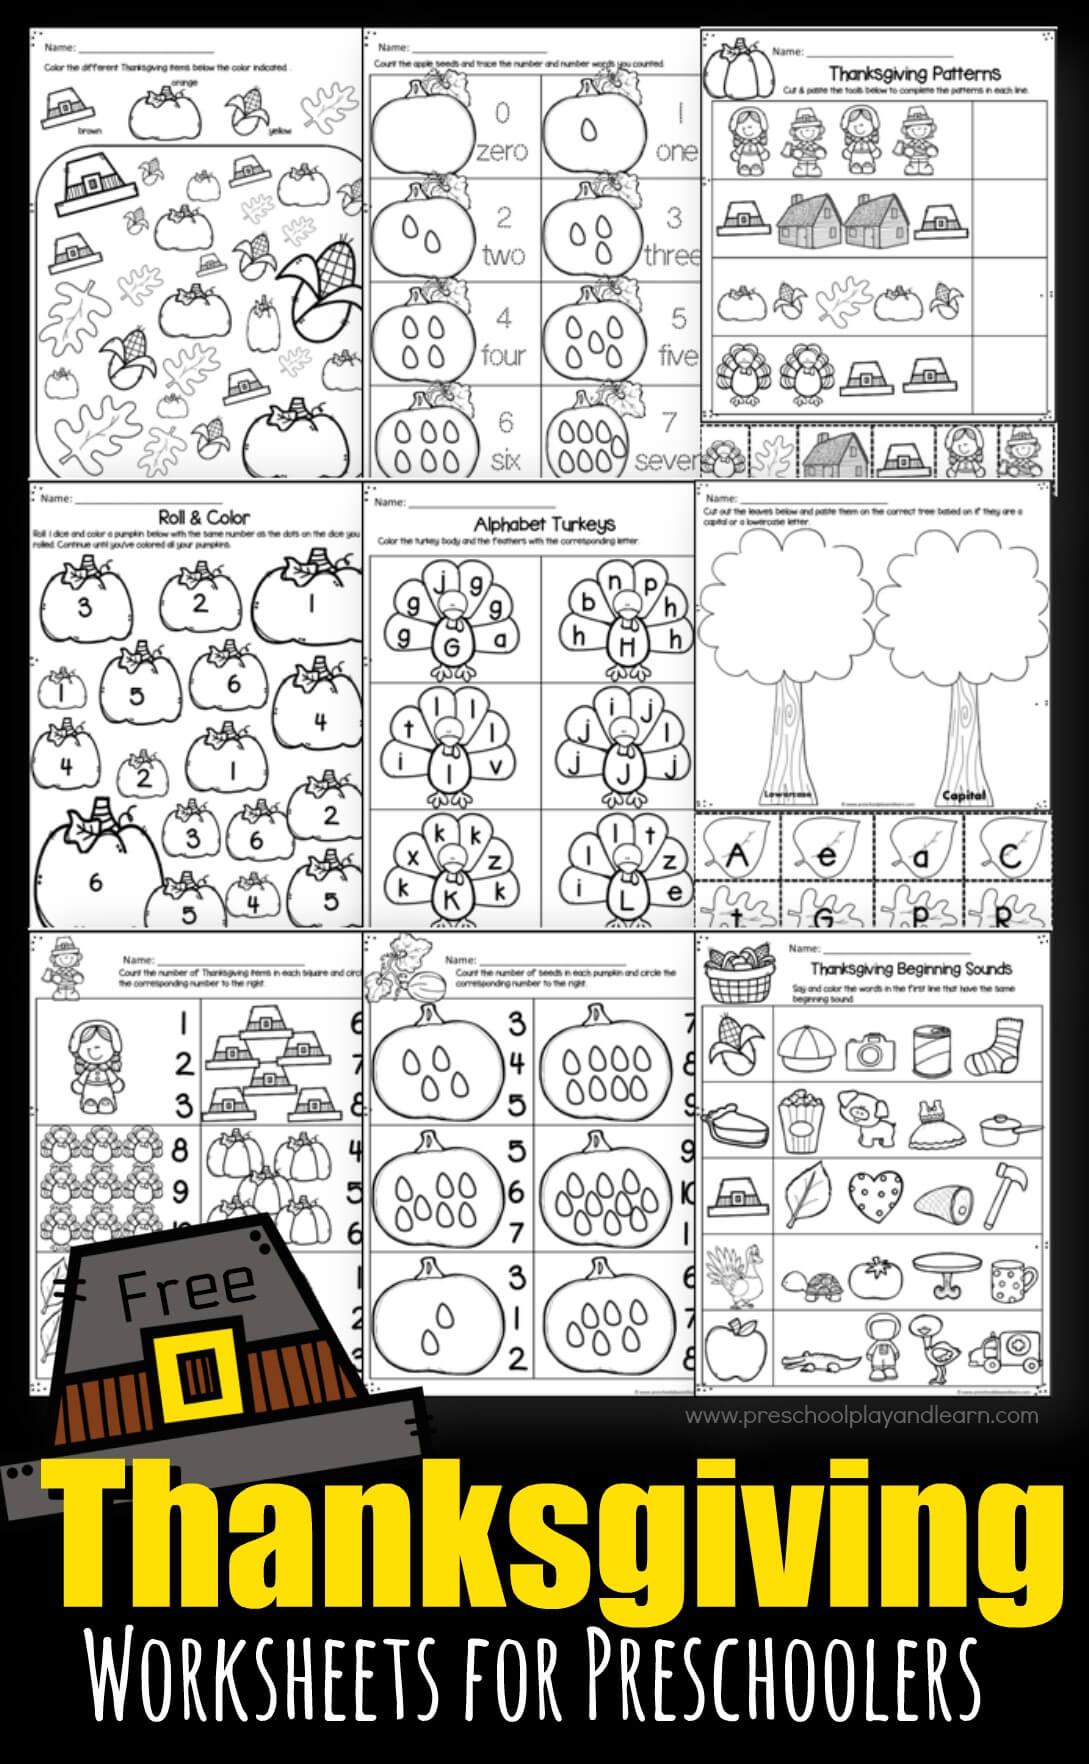 - Thanksgiving Worksheets For Preschoolers